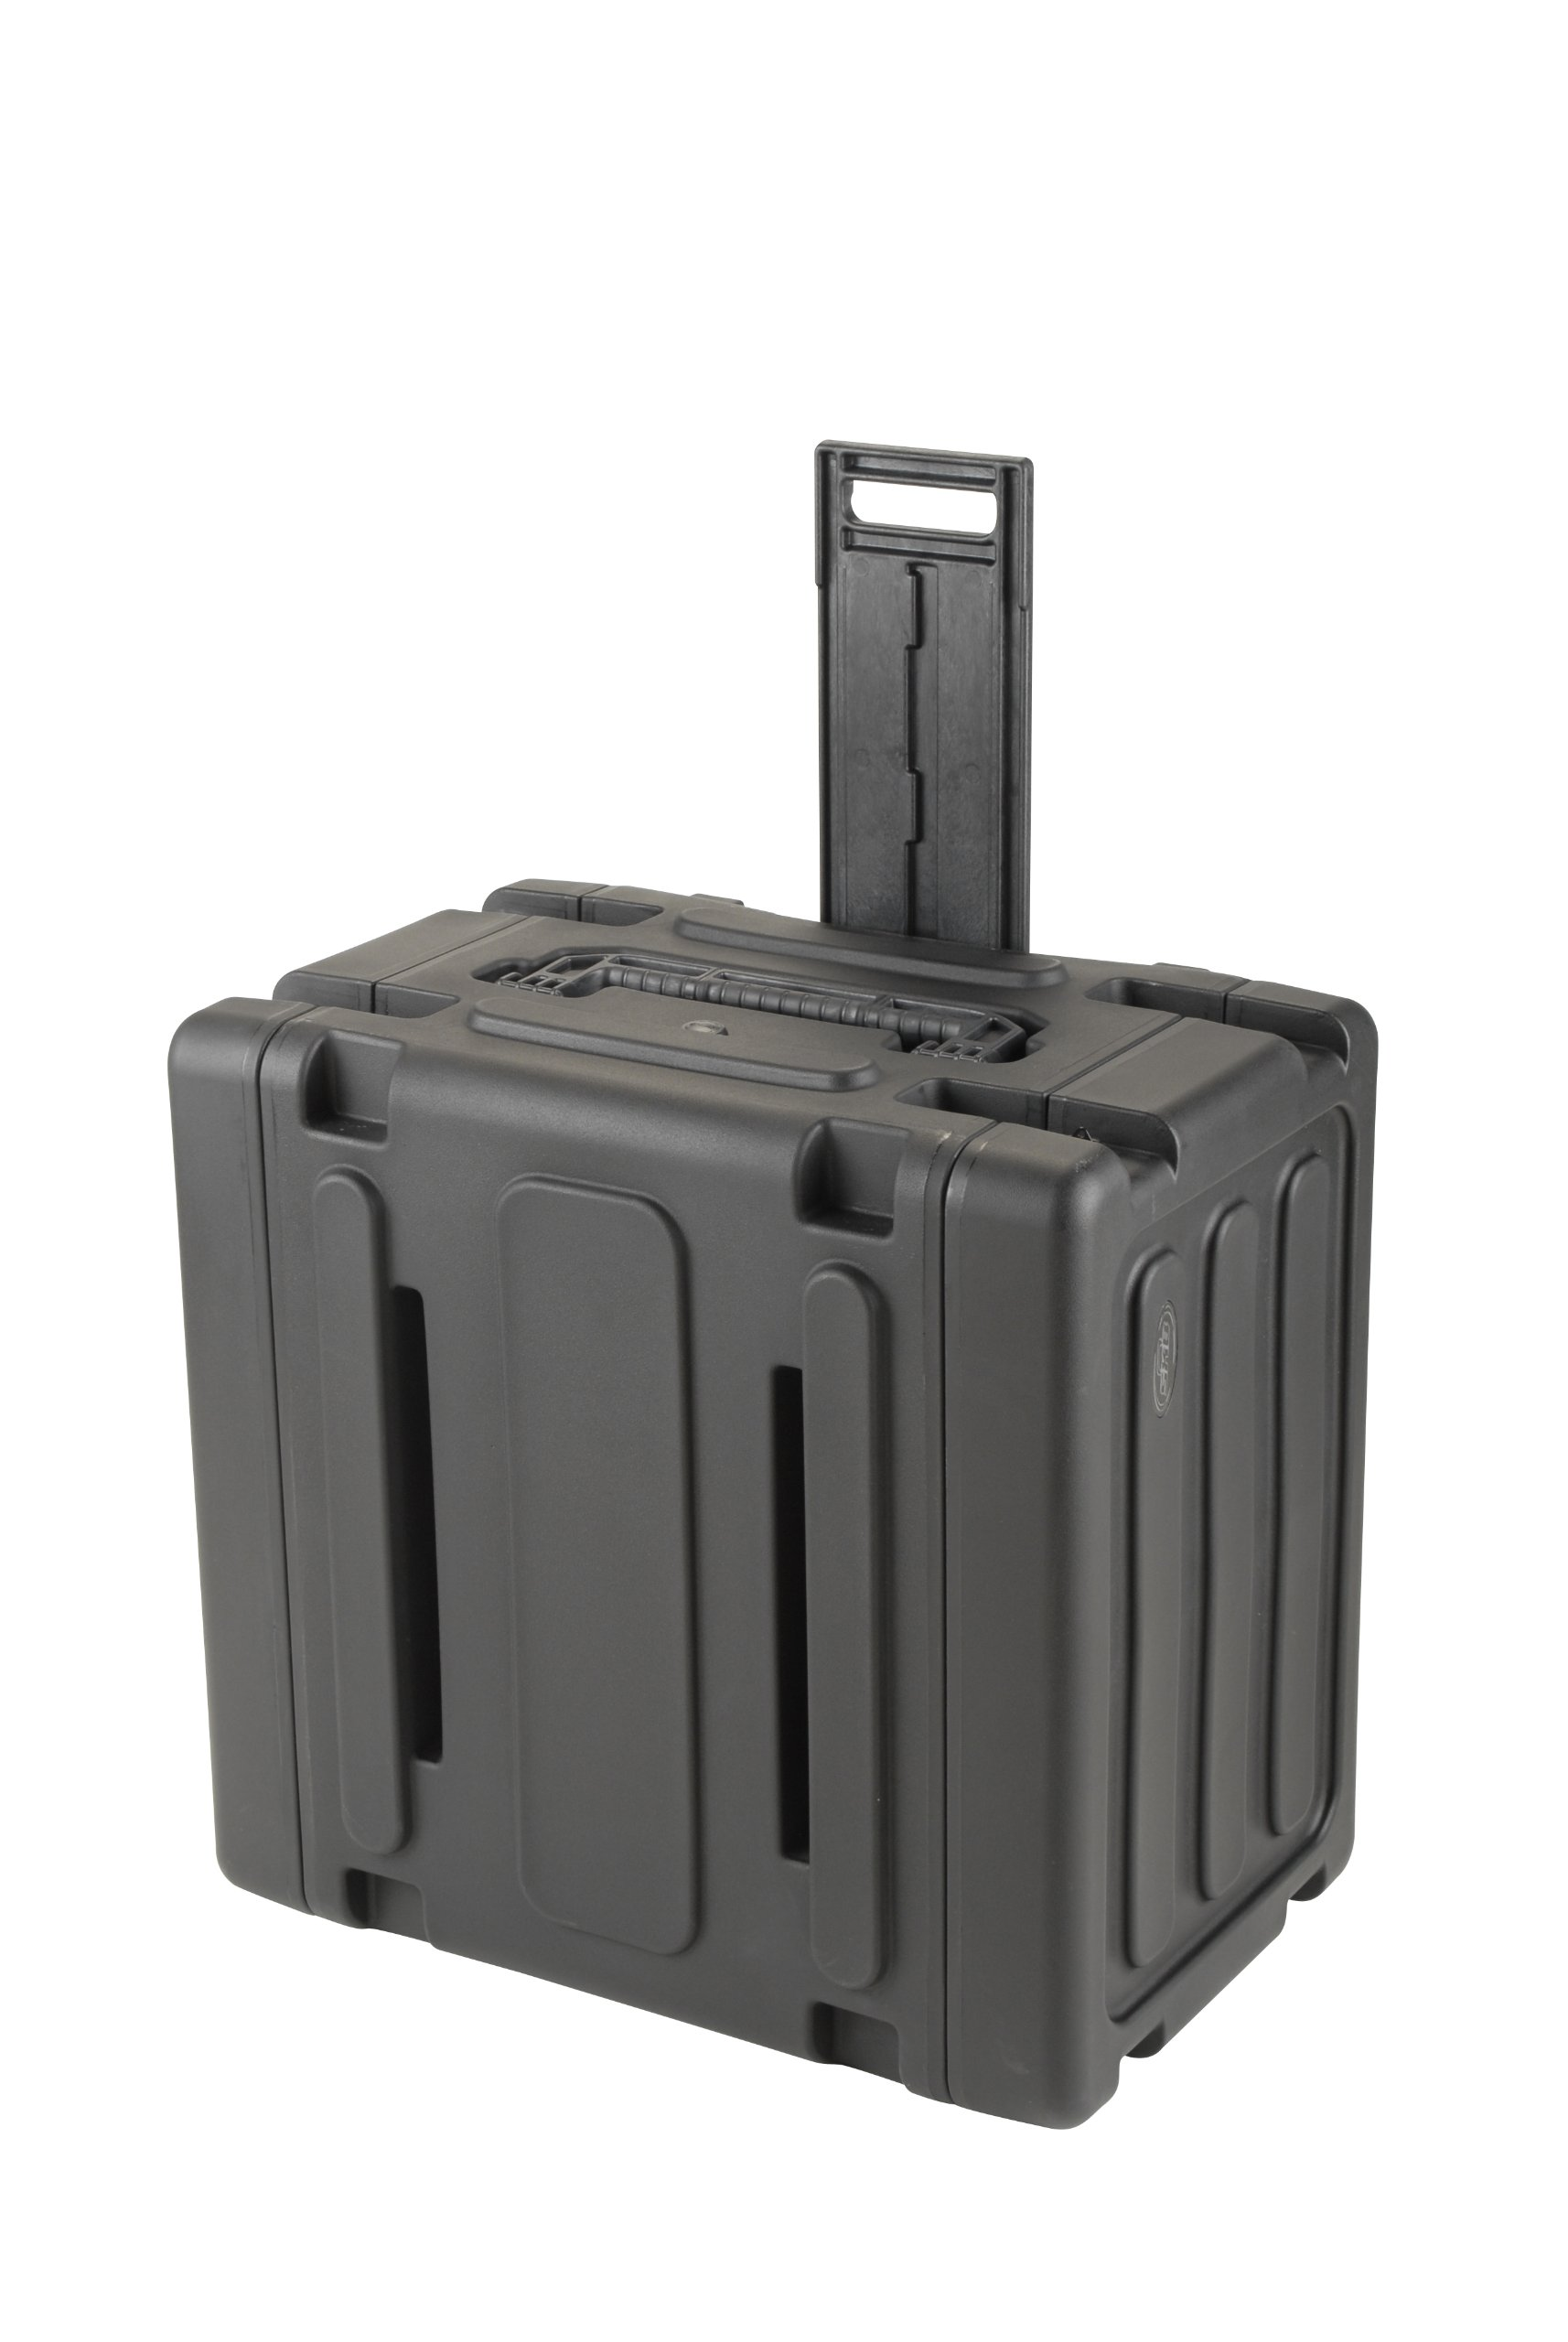 SKB 6U Shock Mount Rack, with Wheels, Handle, TSA Trigger Latches